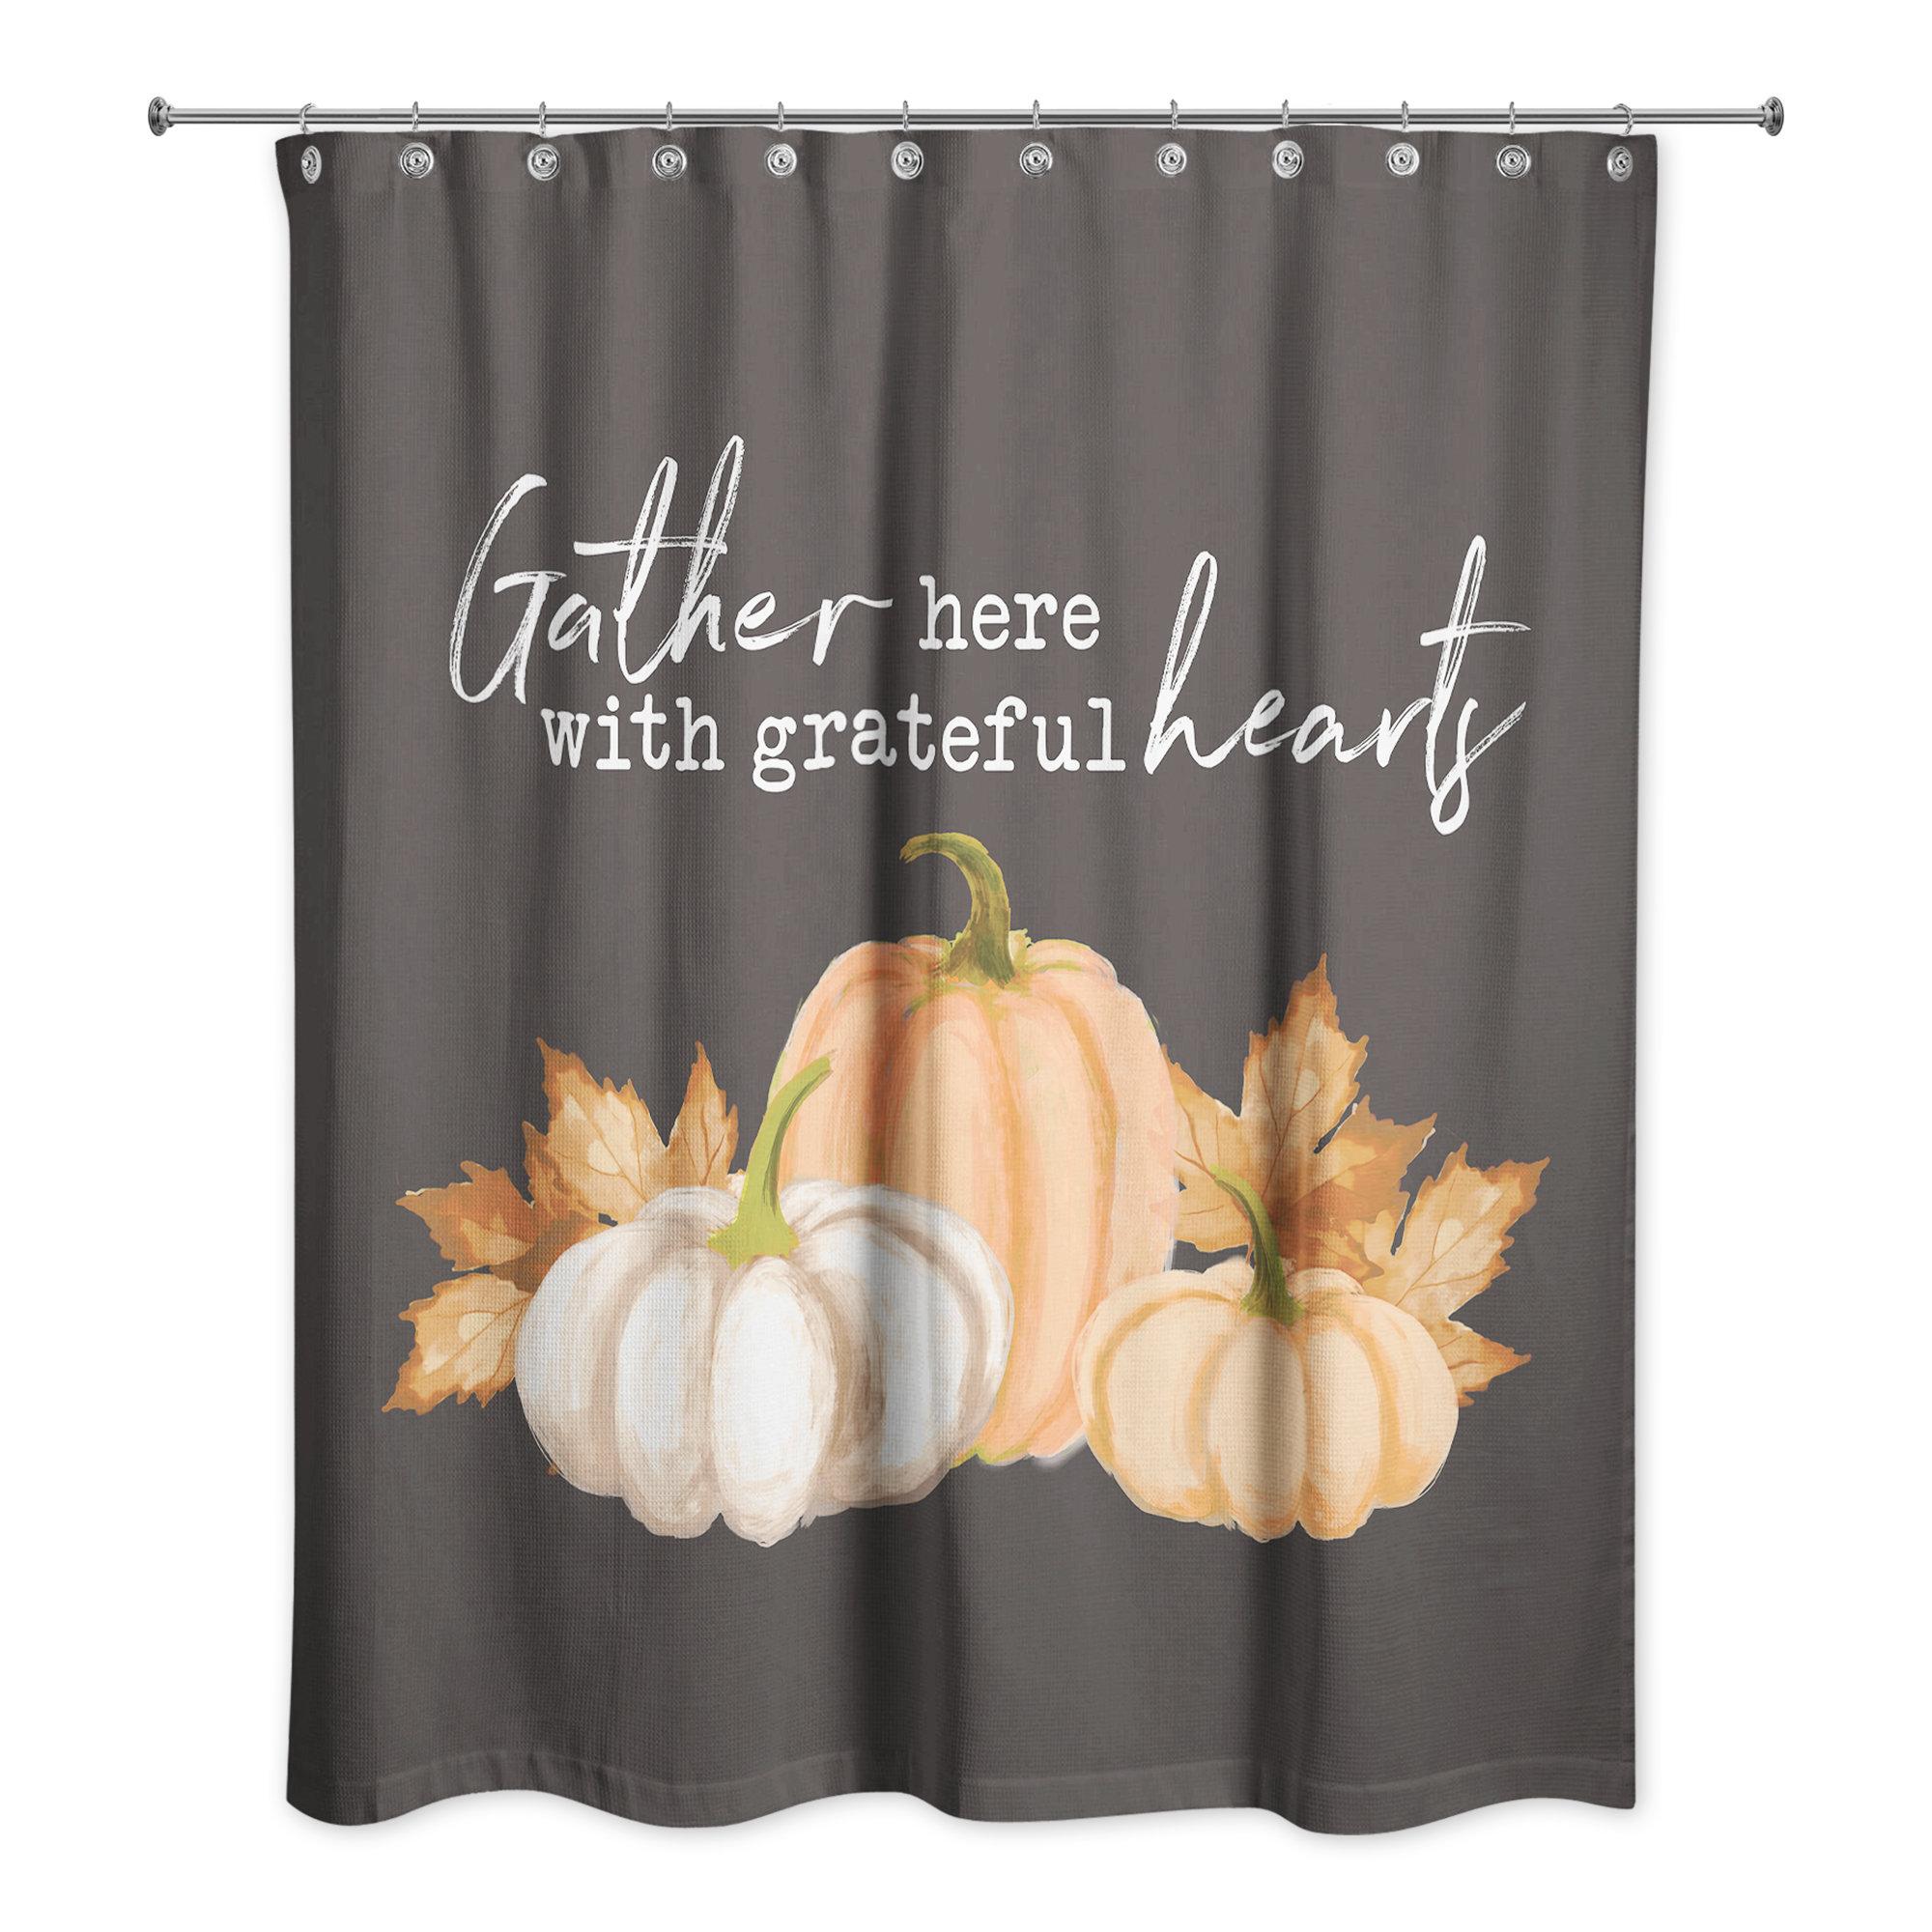 Gracie Oaks Valdes Gather Here Single Shower Curtain Wayfair